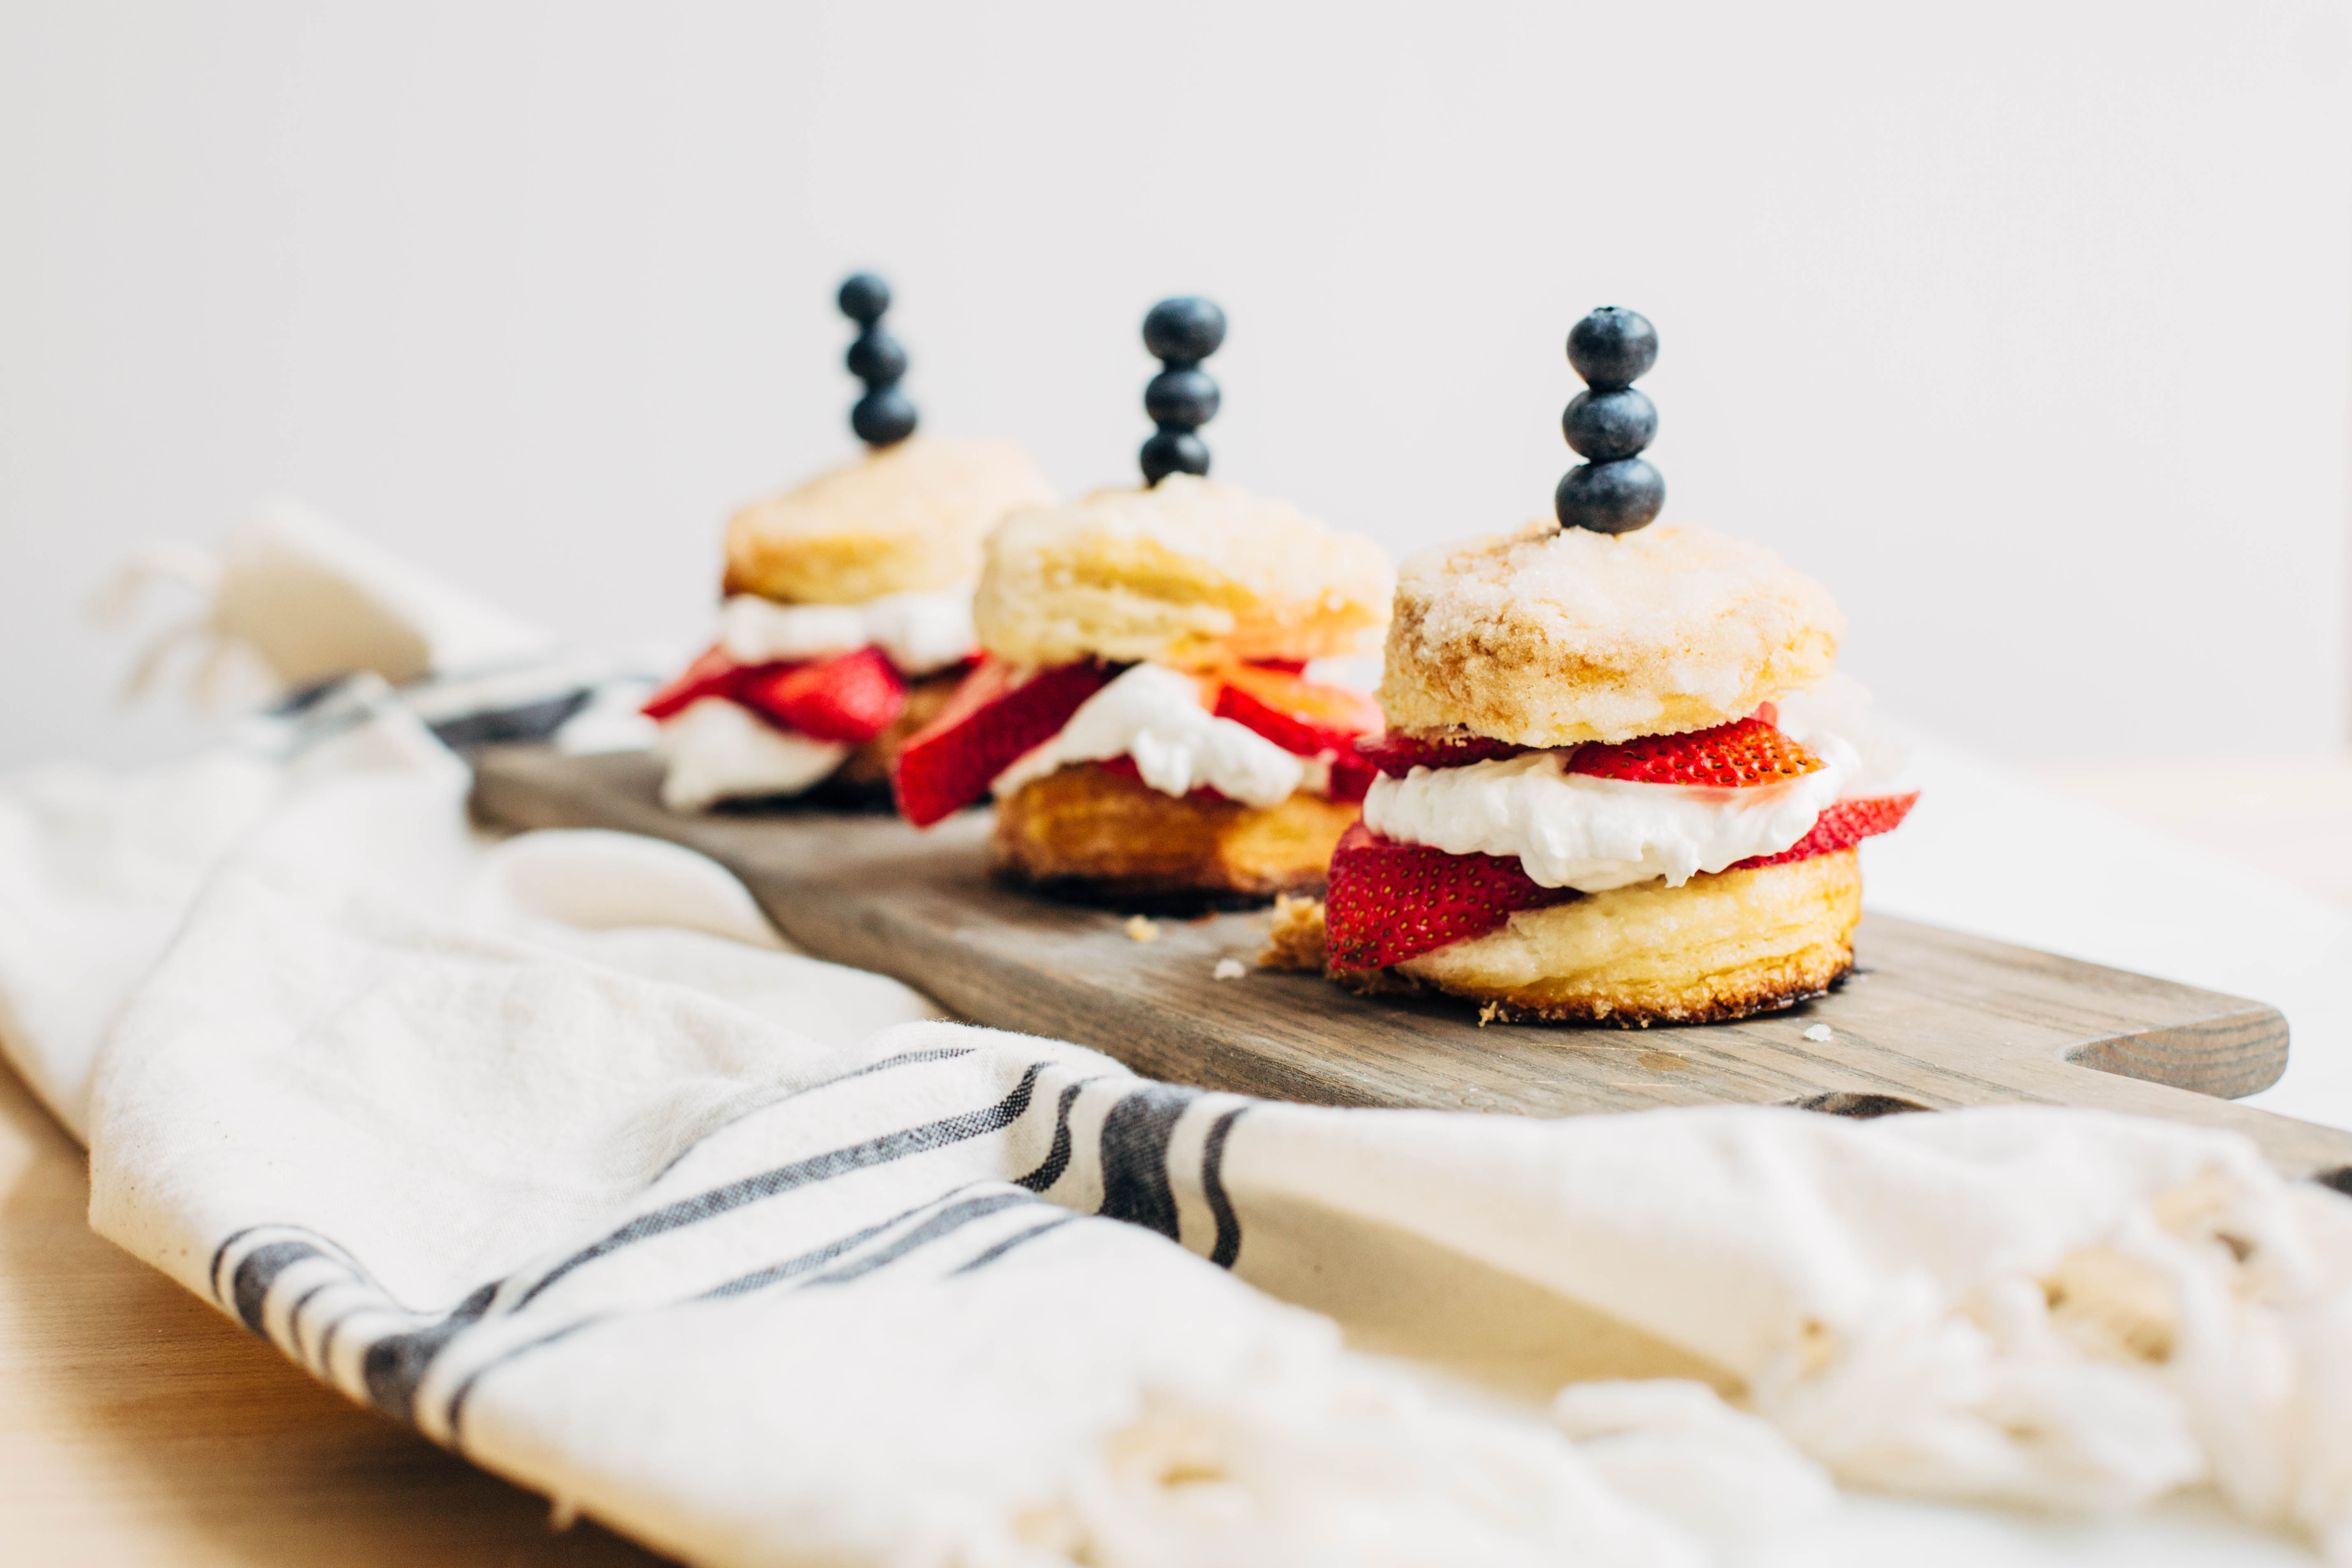 strawberry_shortcake_sliders-13_2.jpg#keepProtocol